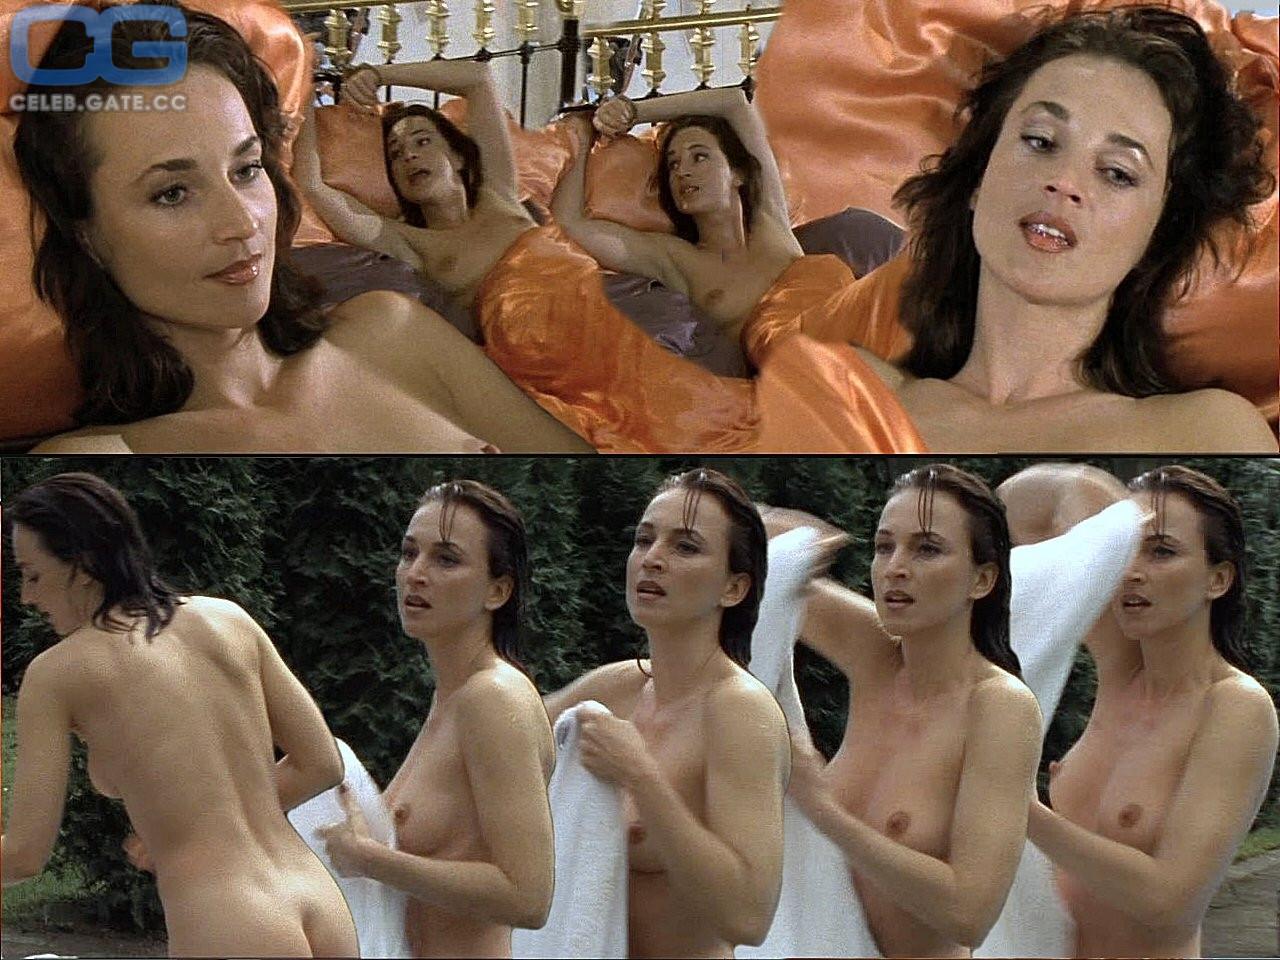 Playboy im caroline nackt beil Caroline Beil